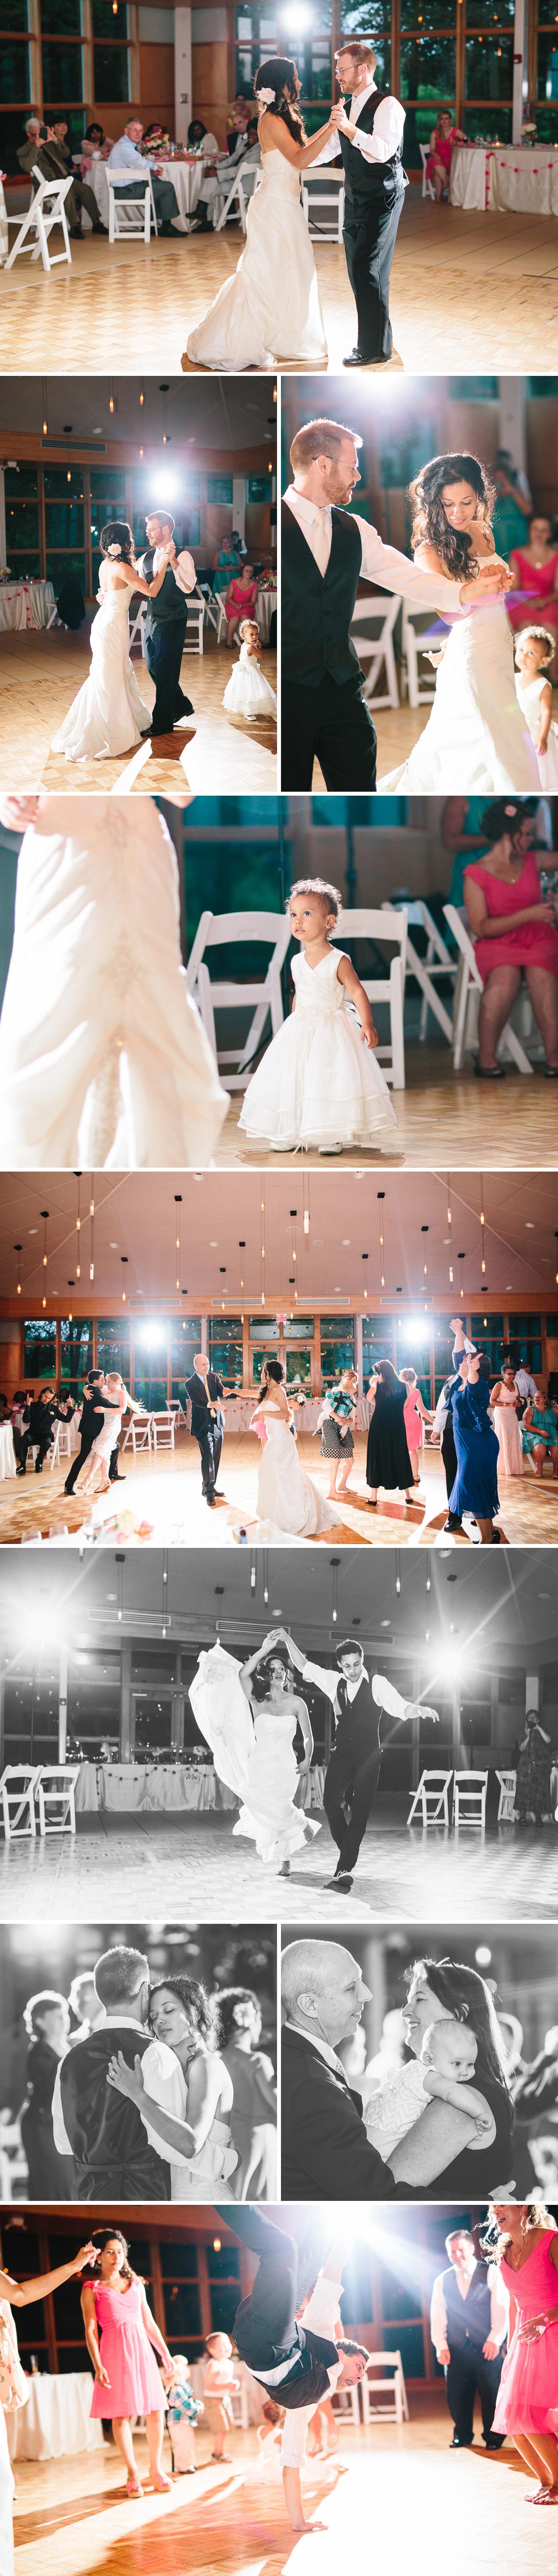 Chicago_Fine_Art_Wedding_Photography_summerfield3.jpg